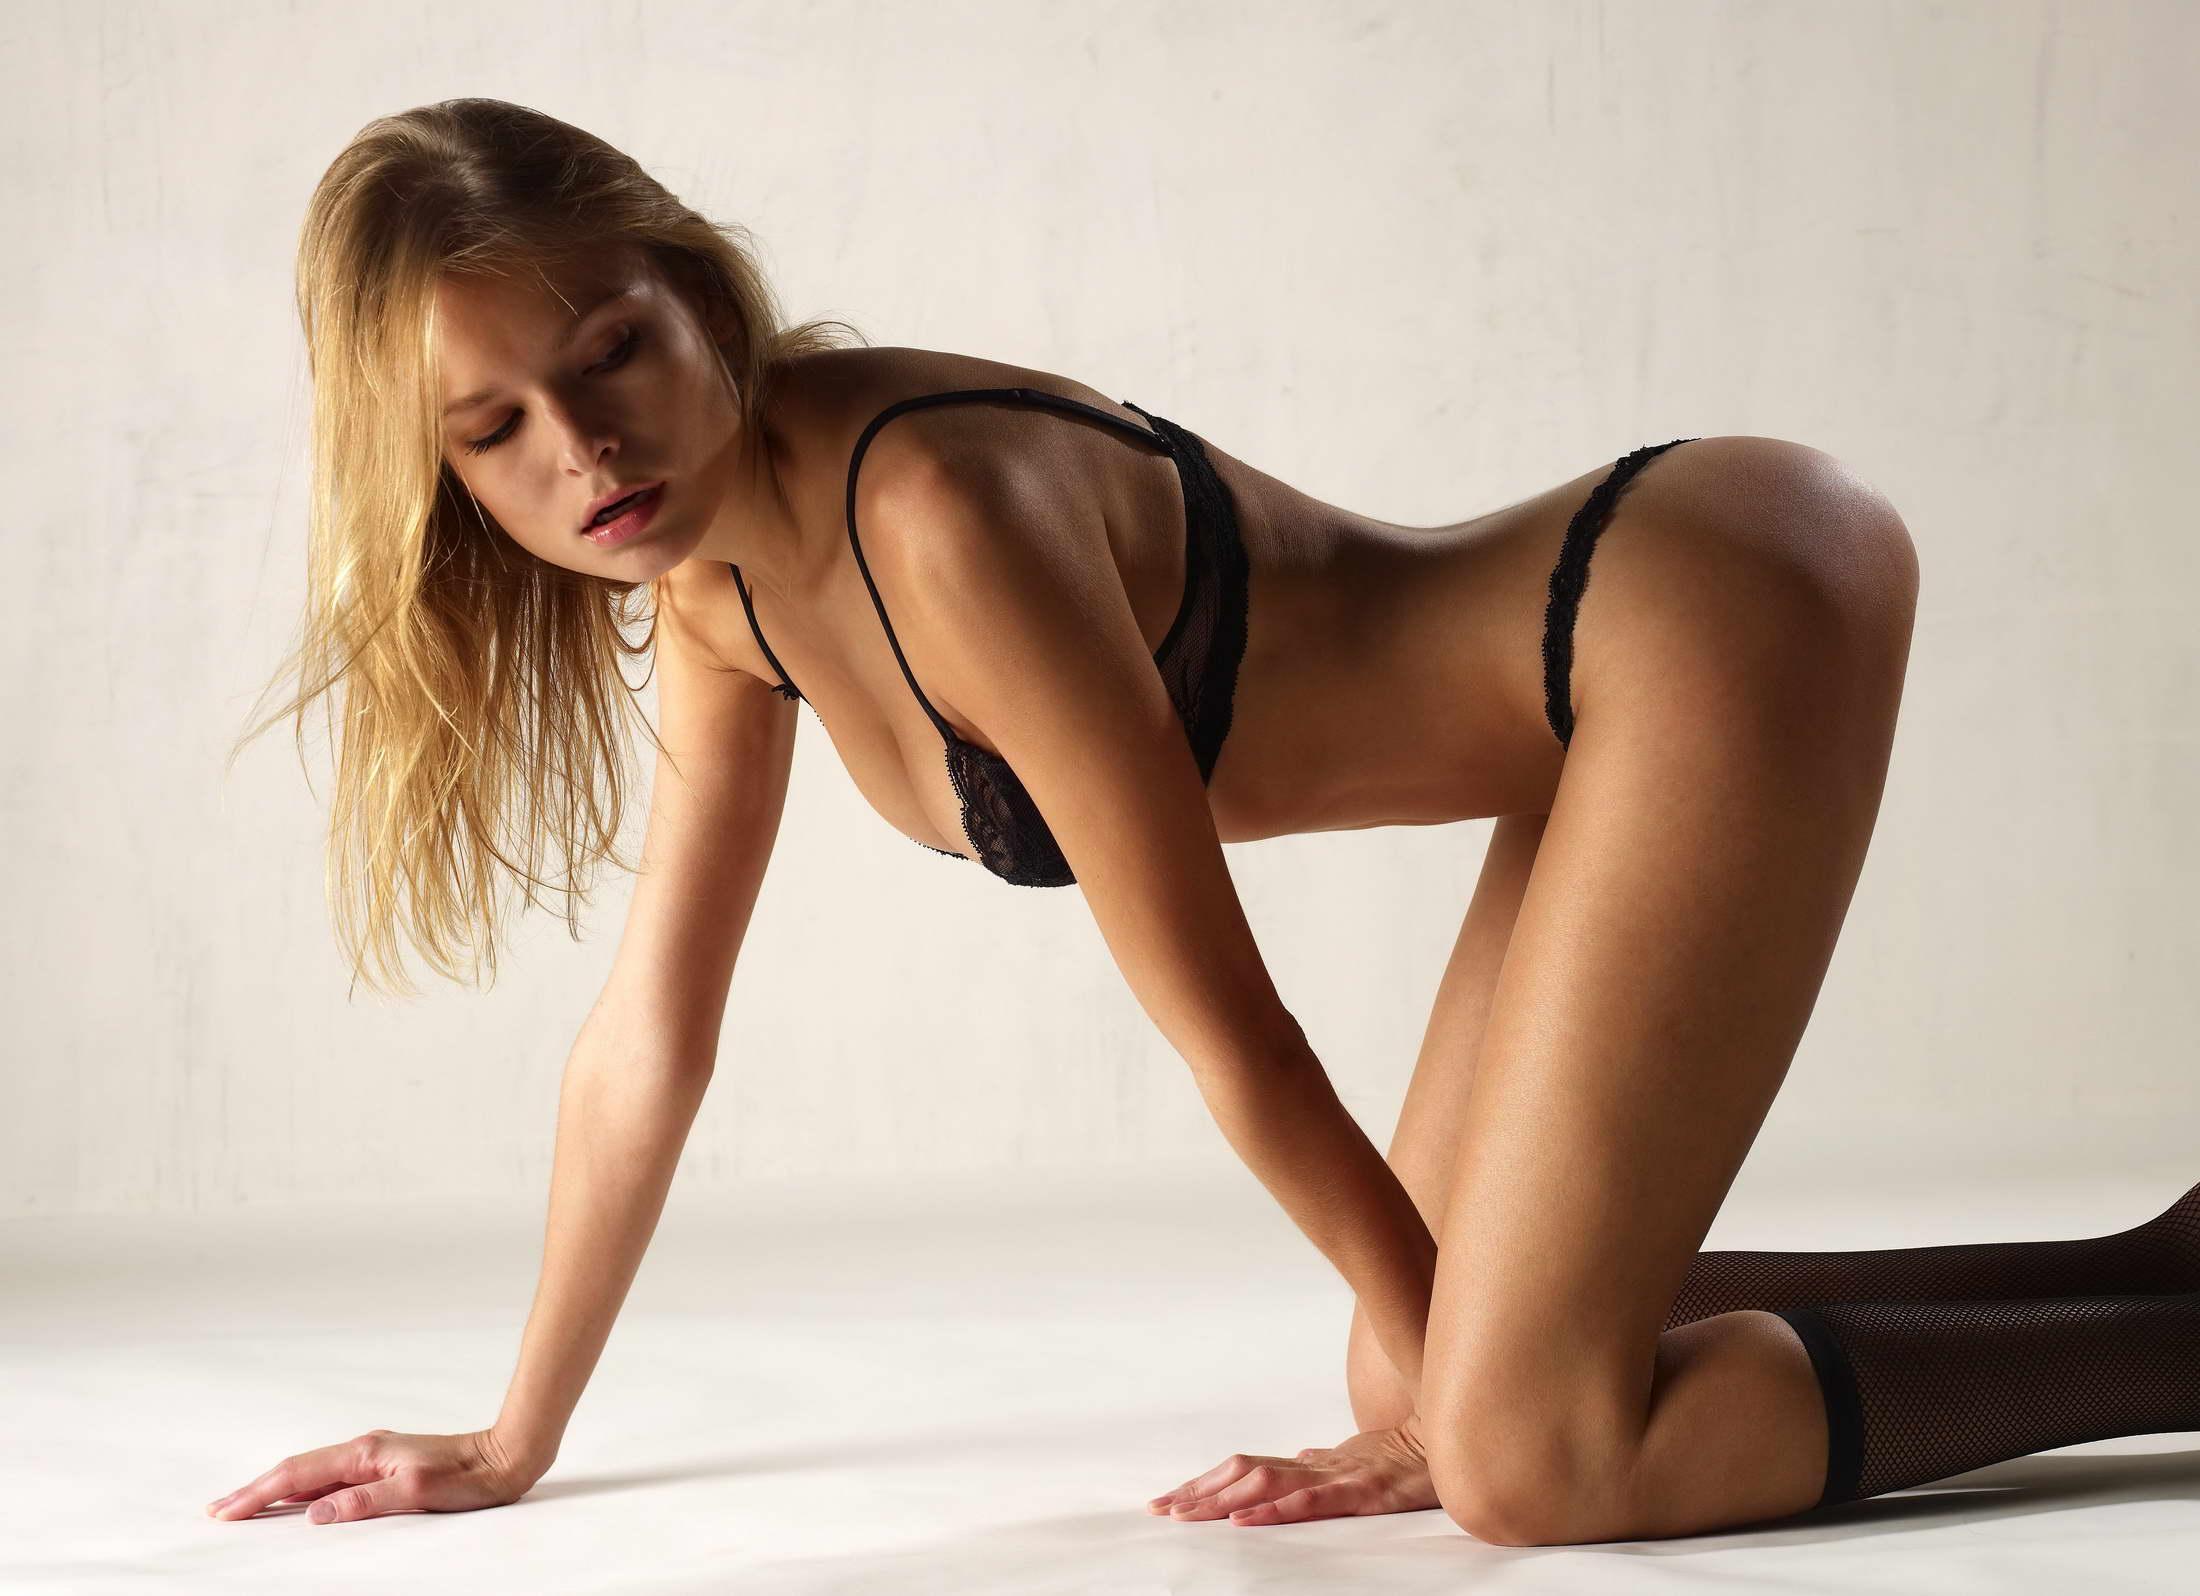 Amazing Flexible Brunette